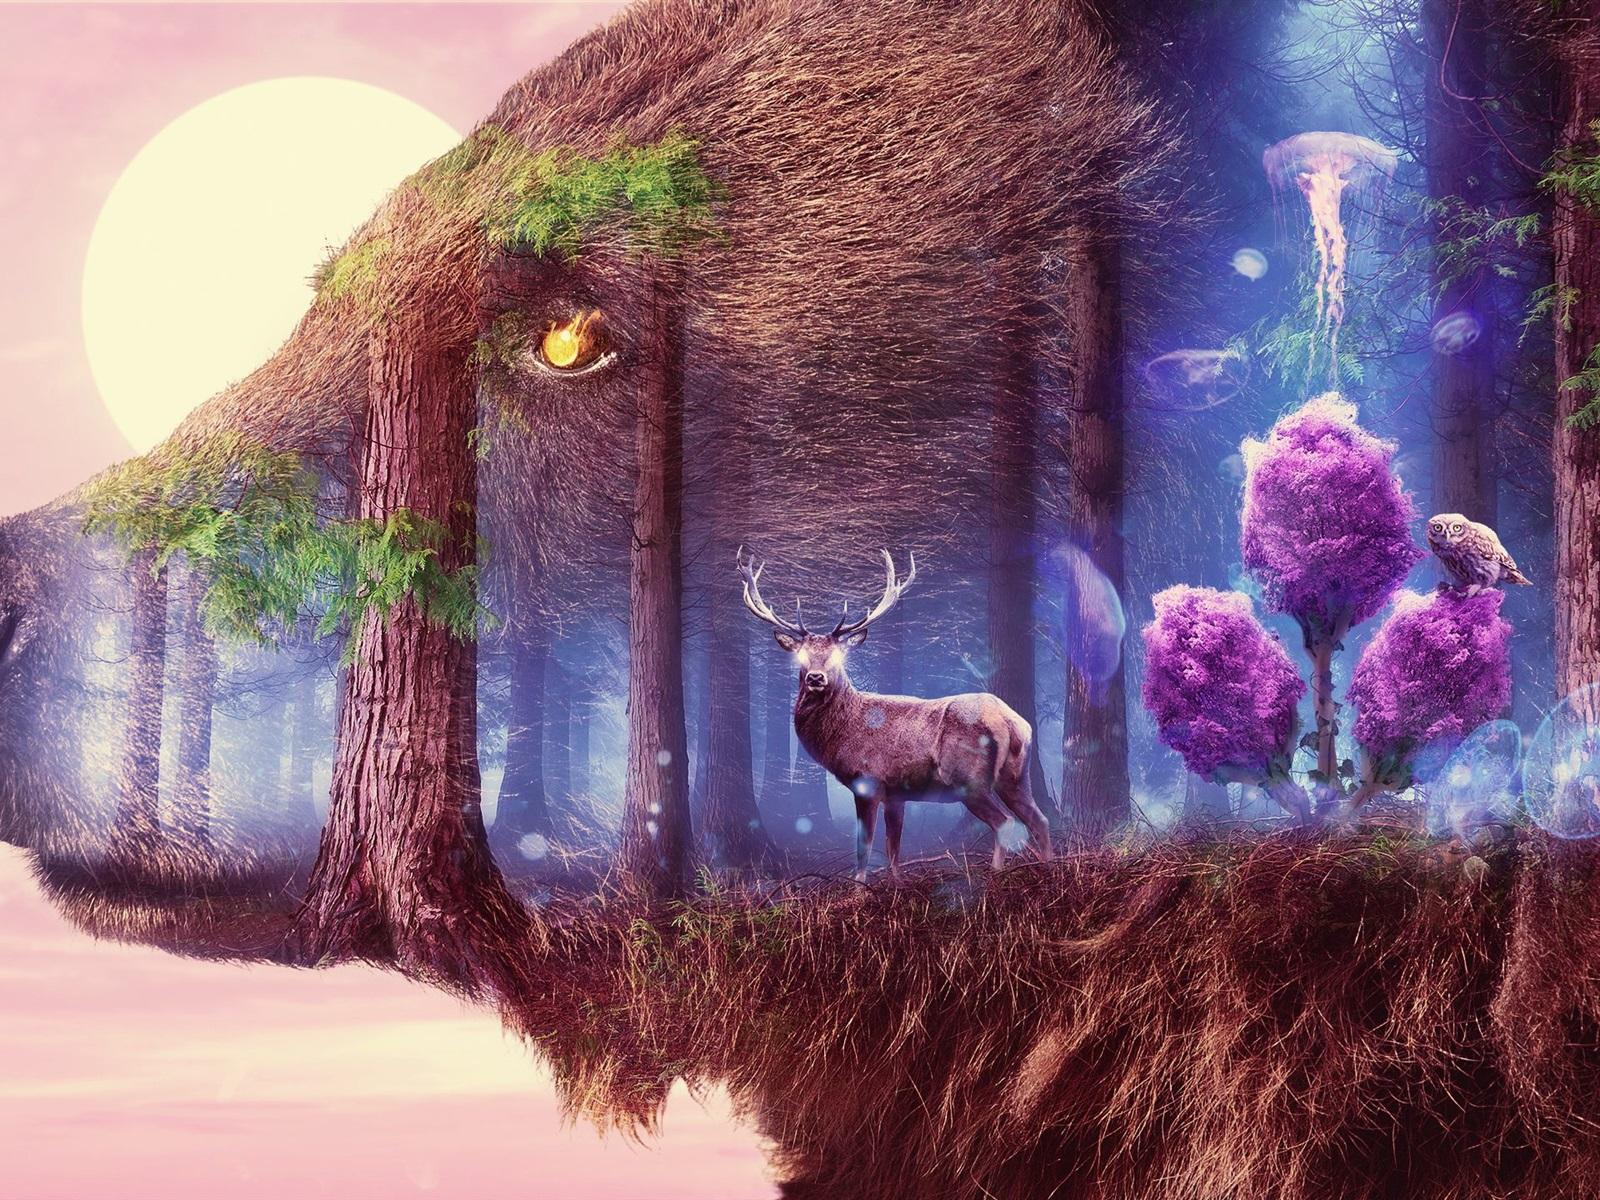 Anime Girl X1200 Wallpaper Big Bear Deer Birds Forest Moon Surrealism